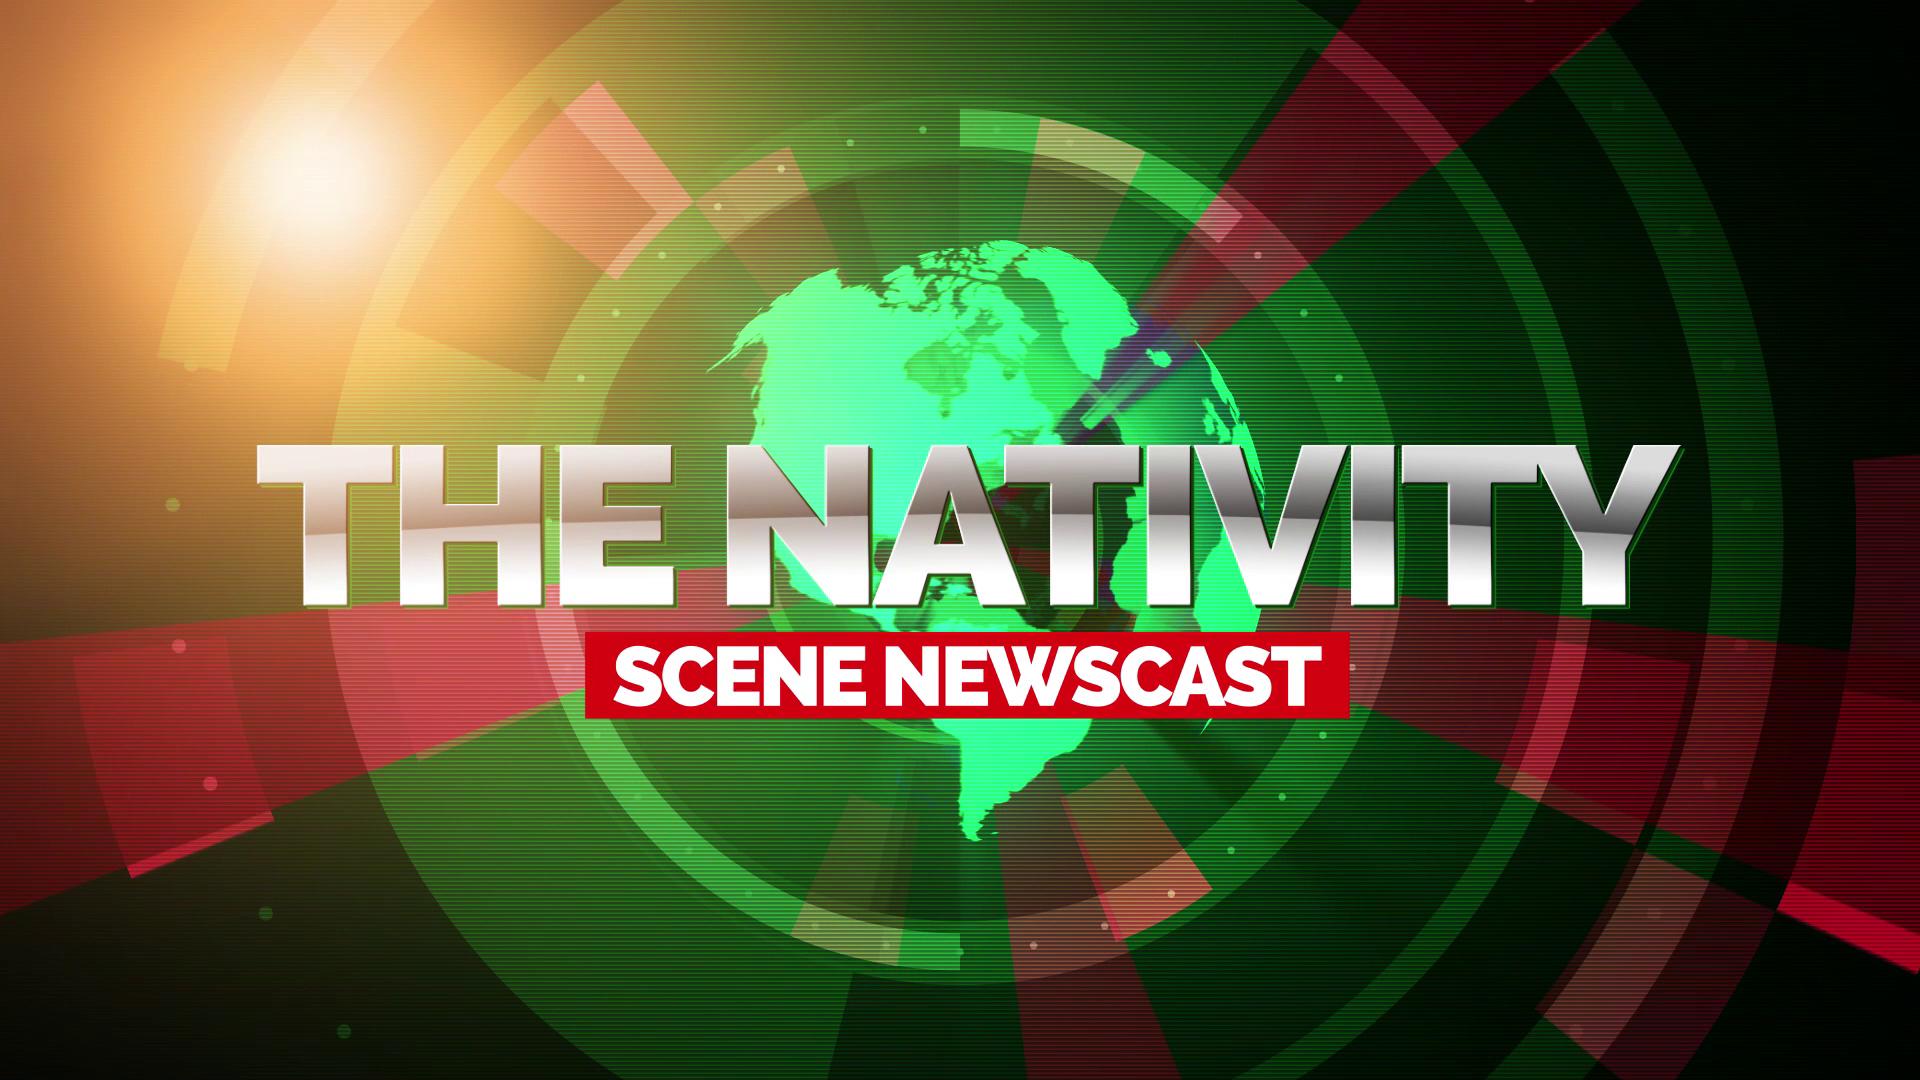 The Nativity Scene Newscast Image